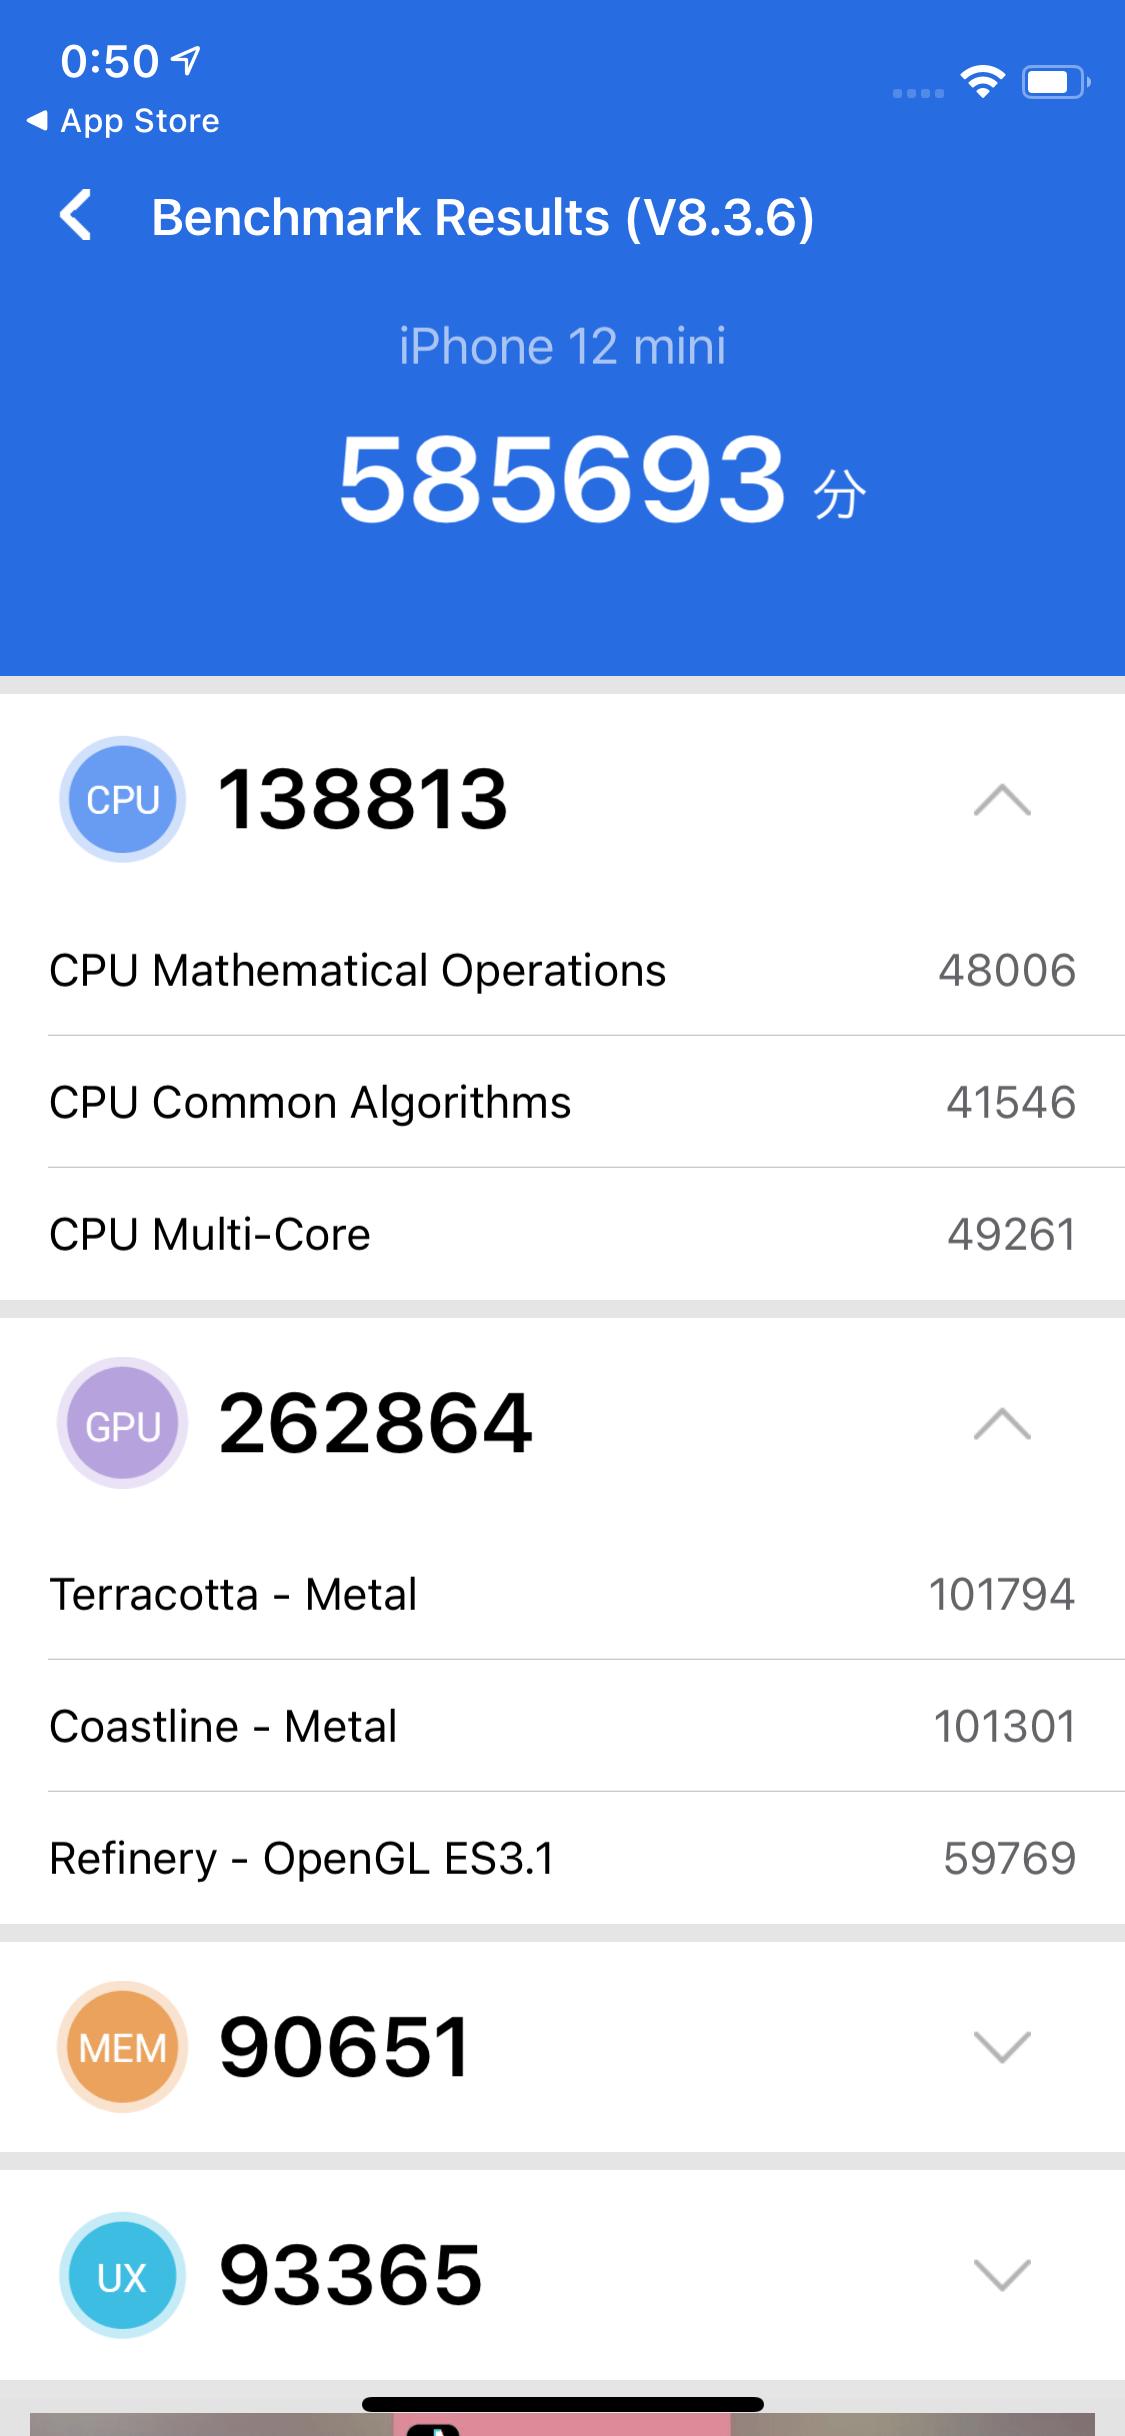 iPhone12 miniをAntutuベンチマークで測定した結果